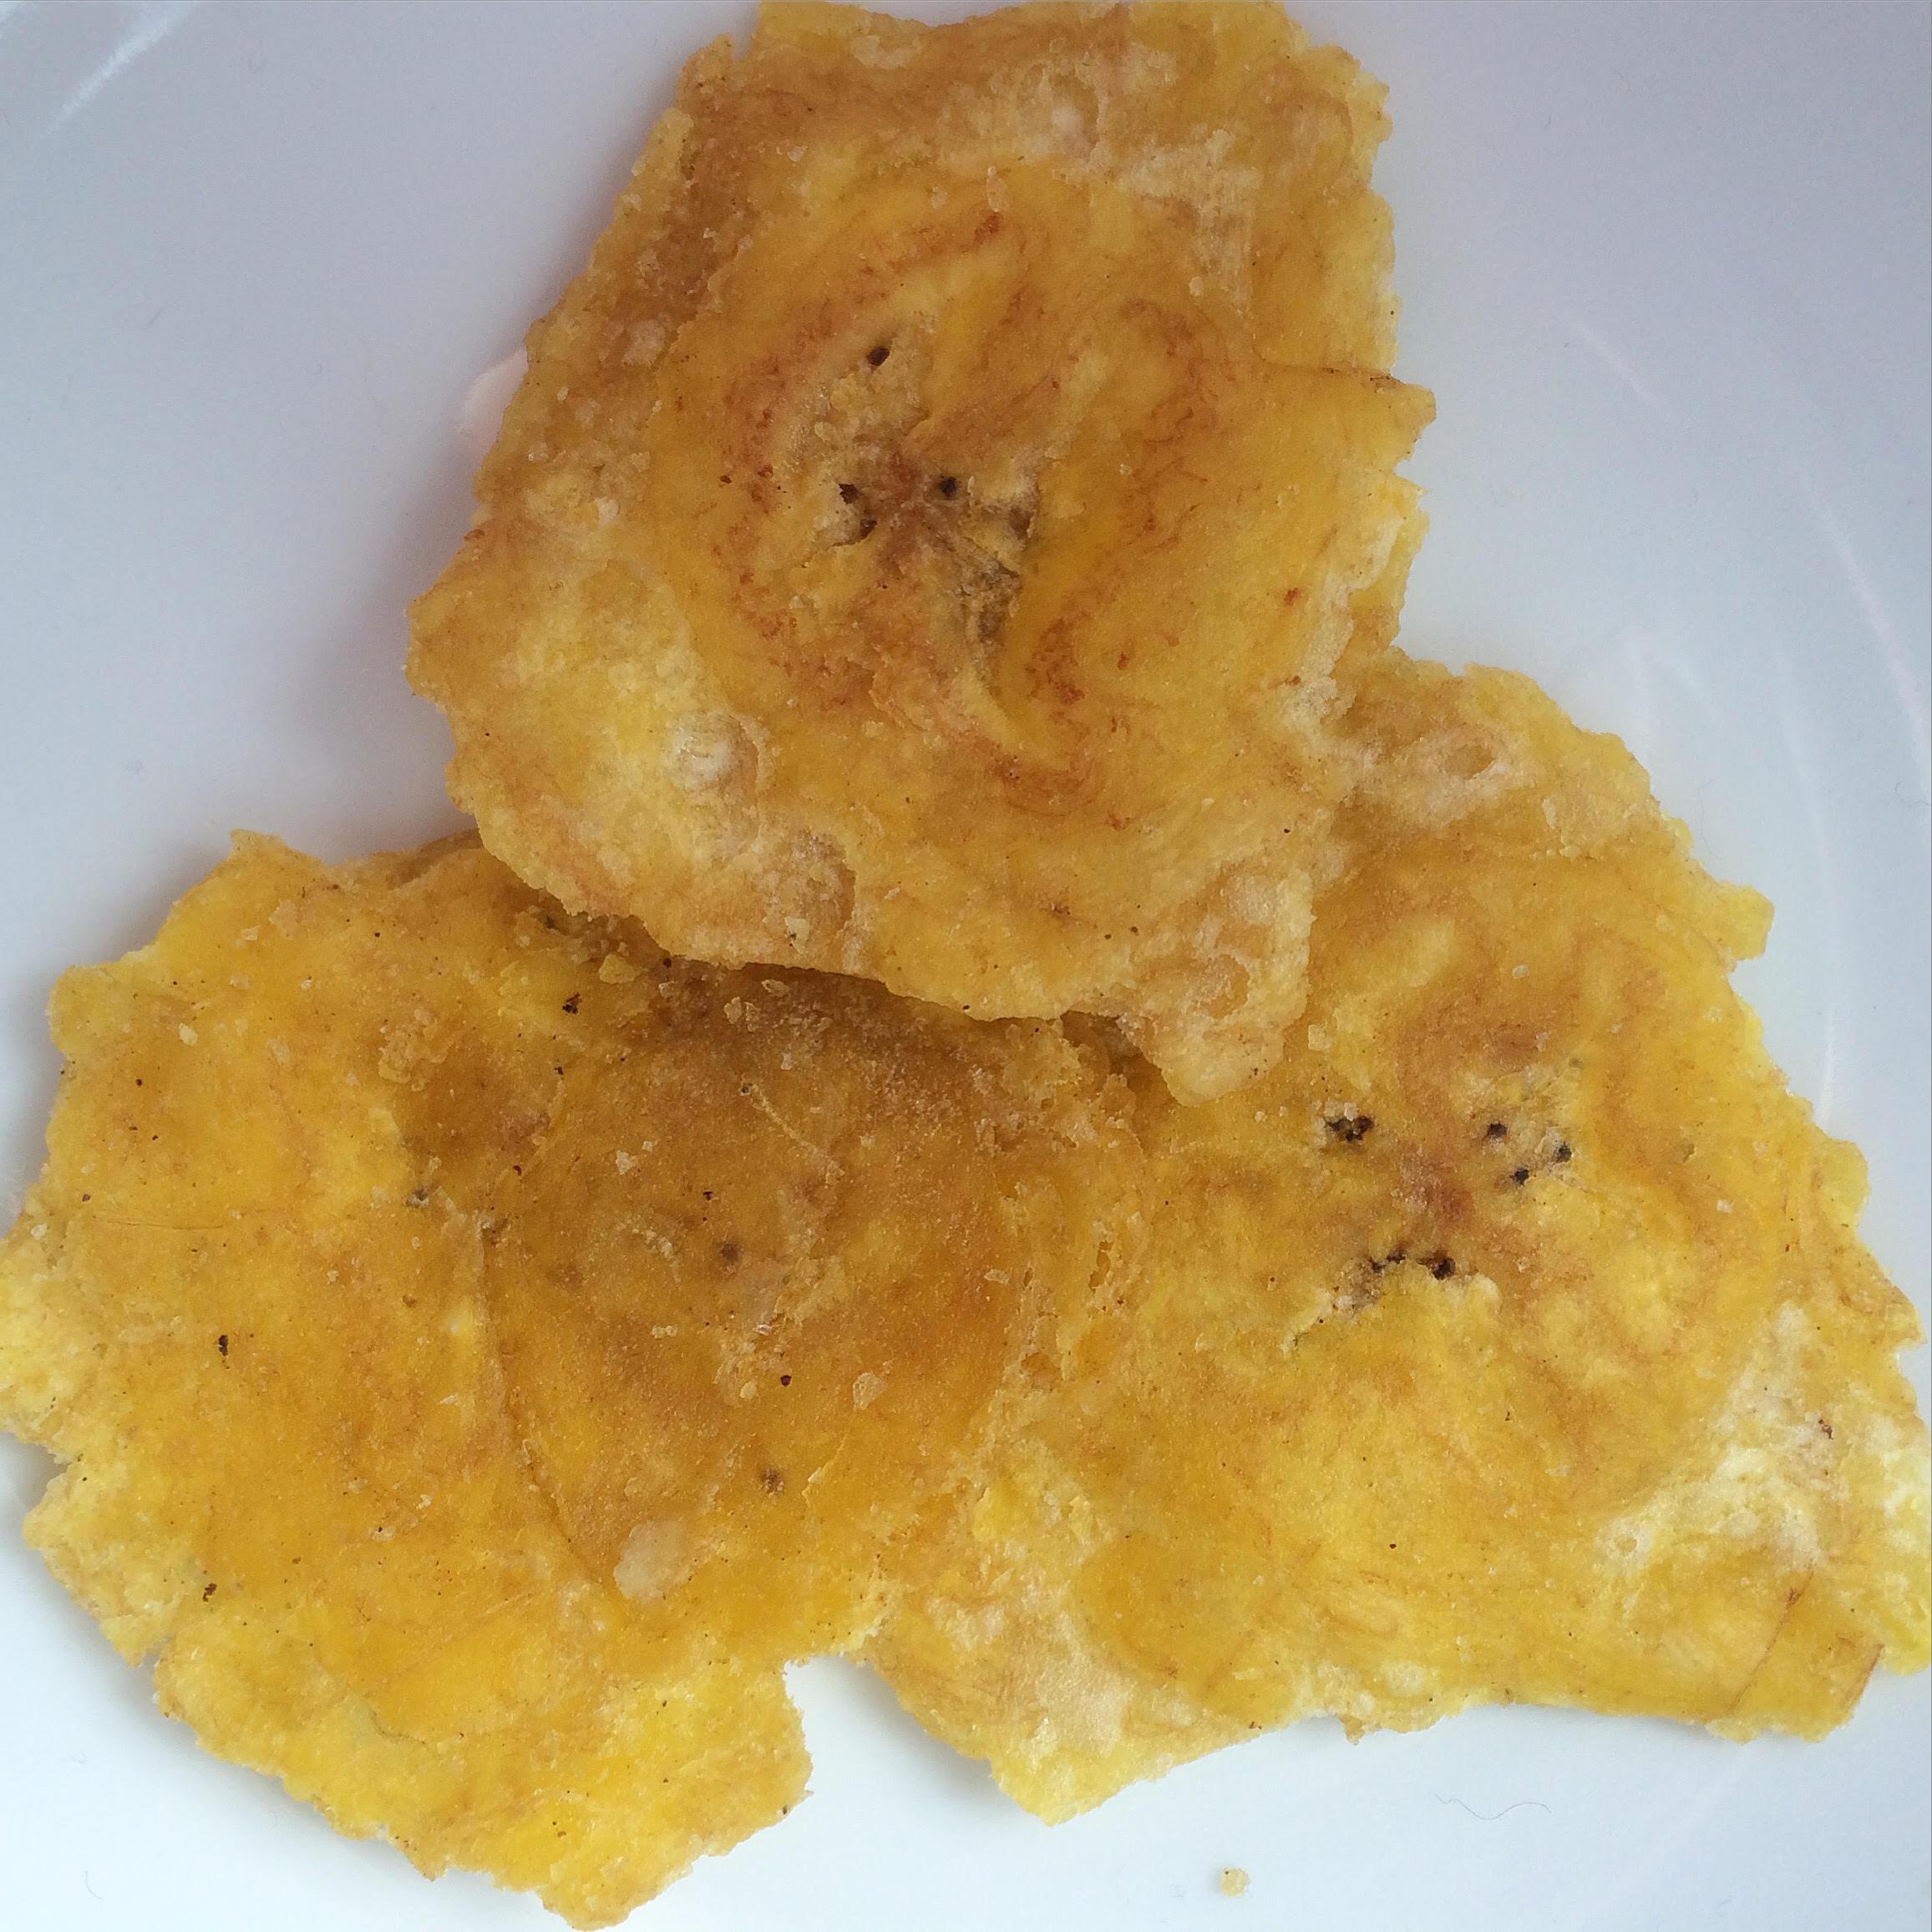 Ecuadorian food: Patacones and green plantain chips